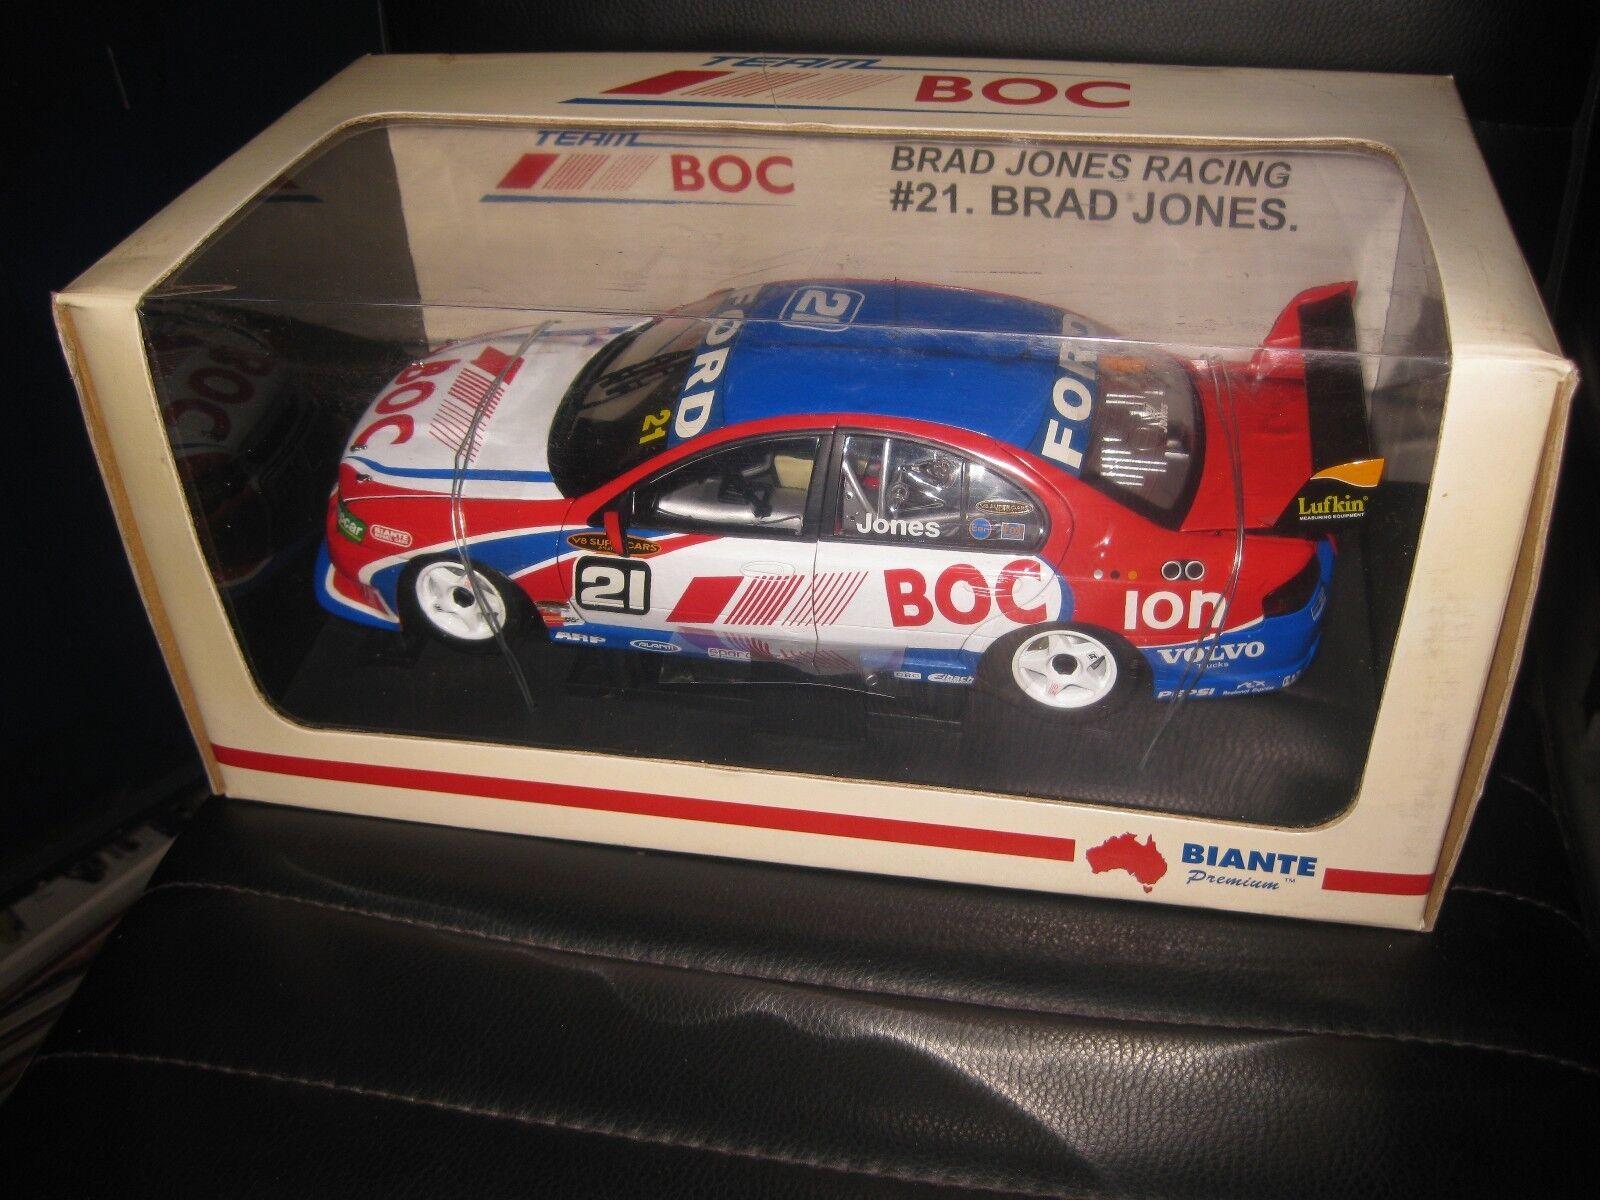 BIANTE 1.18 FORD FALCON BA BRAD JONES RACING B JONES 2005 BOC V8 SUPERCAR  21